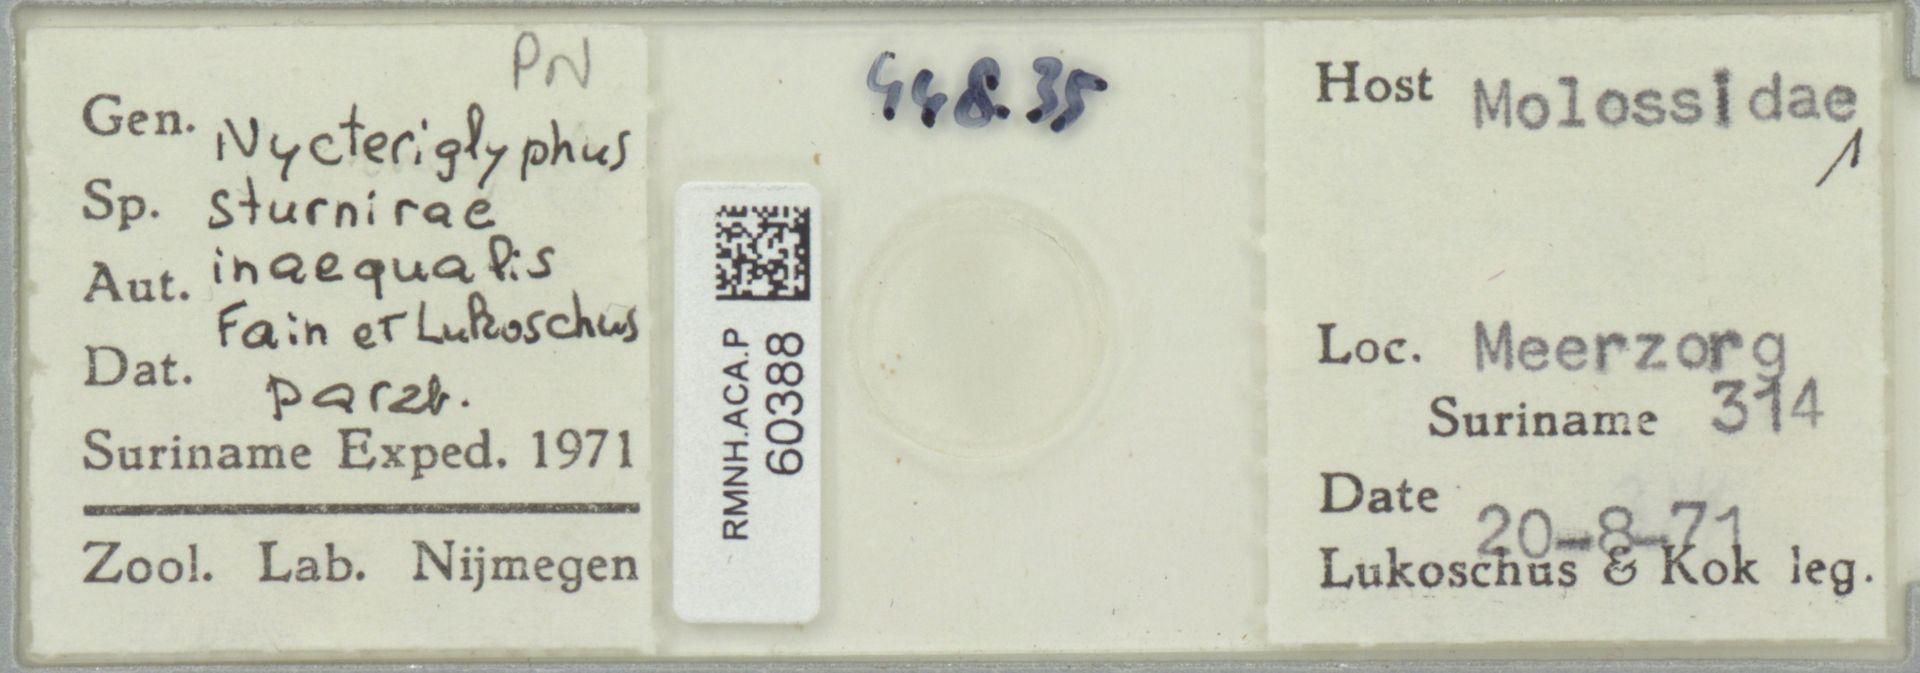 RMNH.ACA.P.60388 | Nycteriglyphus sturnirae inaequalis Fain & Lukoschus